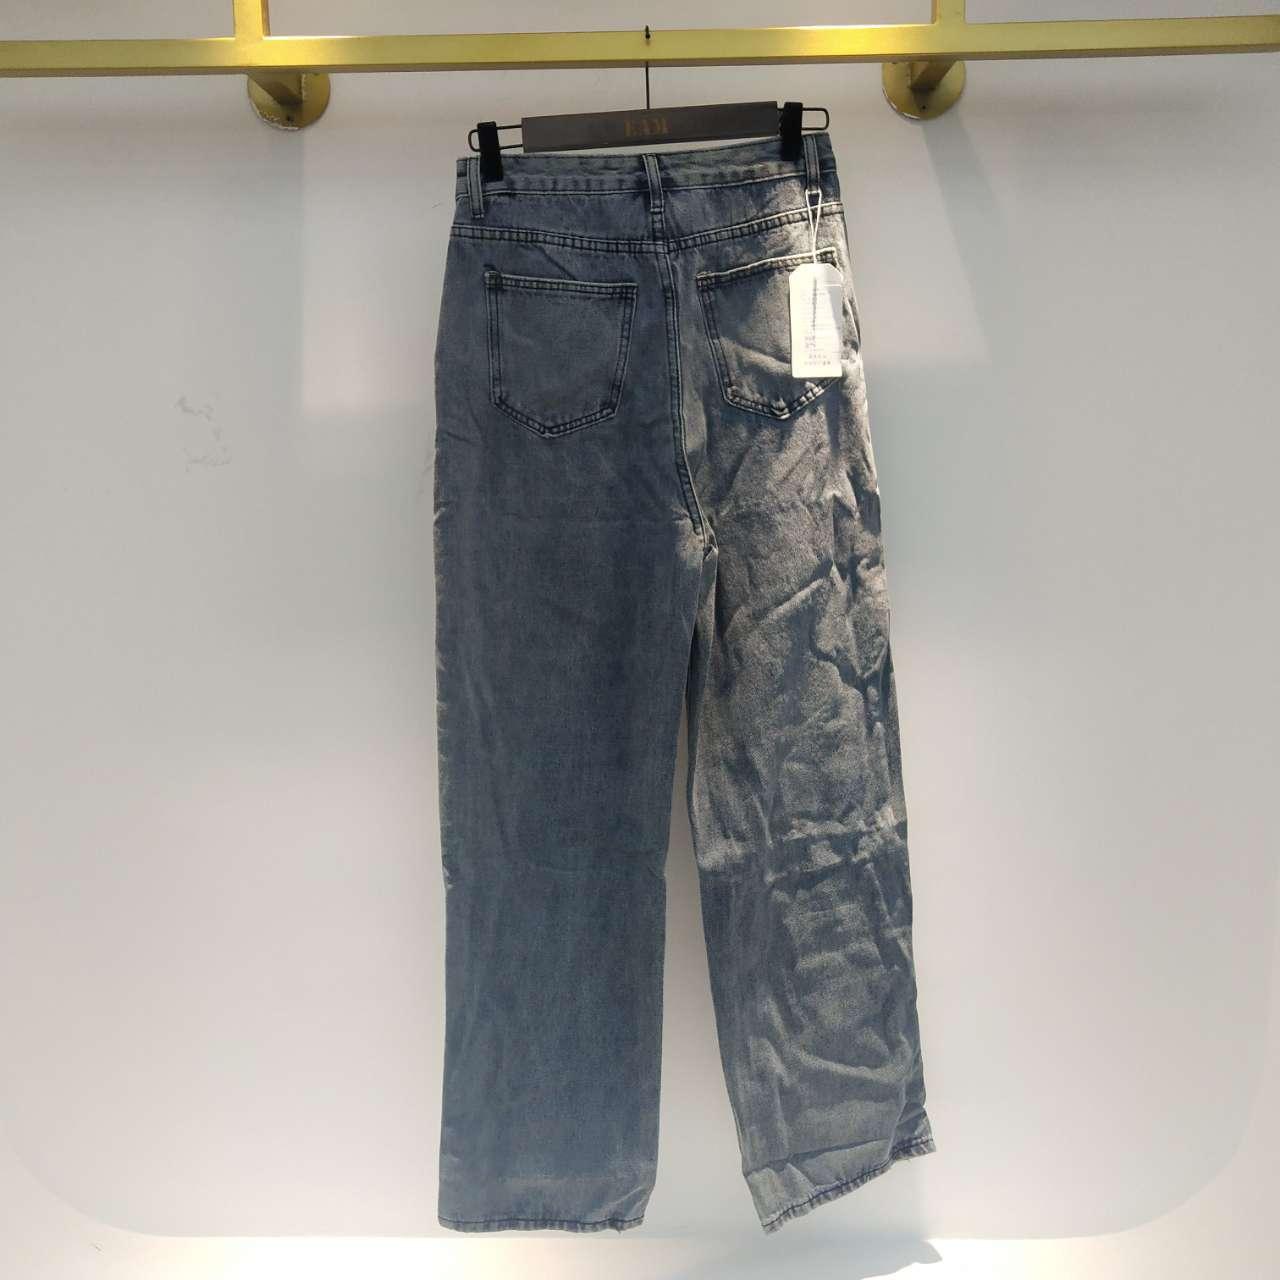 SHENGPALAE 2021 New Summer Vintage Jeans Woman Long Trousers Cowboy Female Loose Streetwear Butterfly Print Pants ZA4110 6